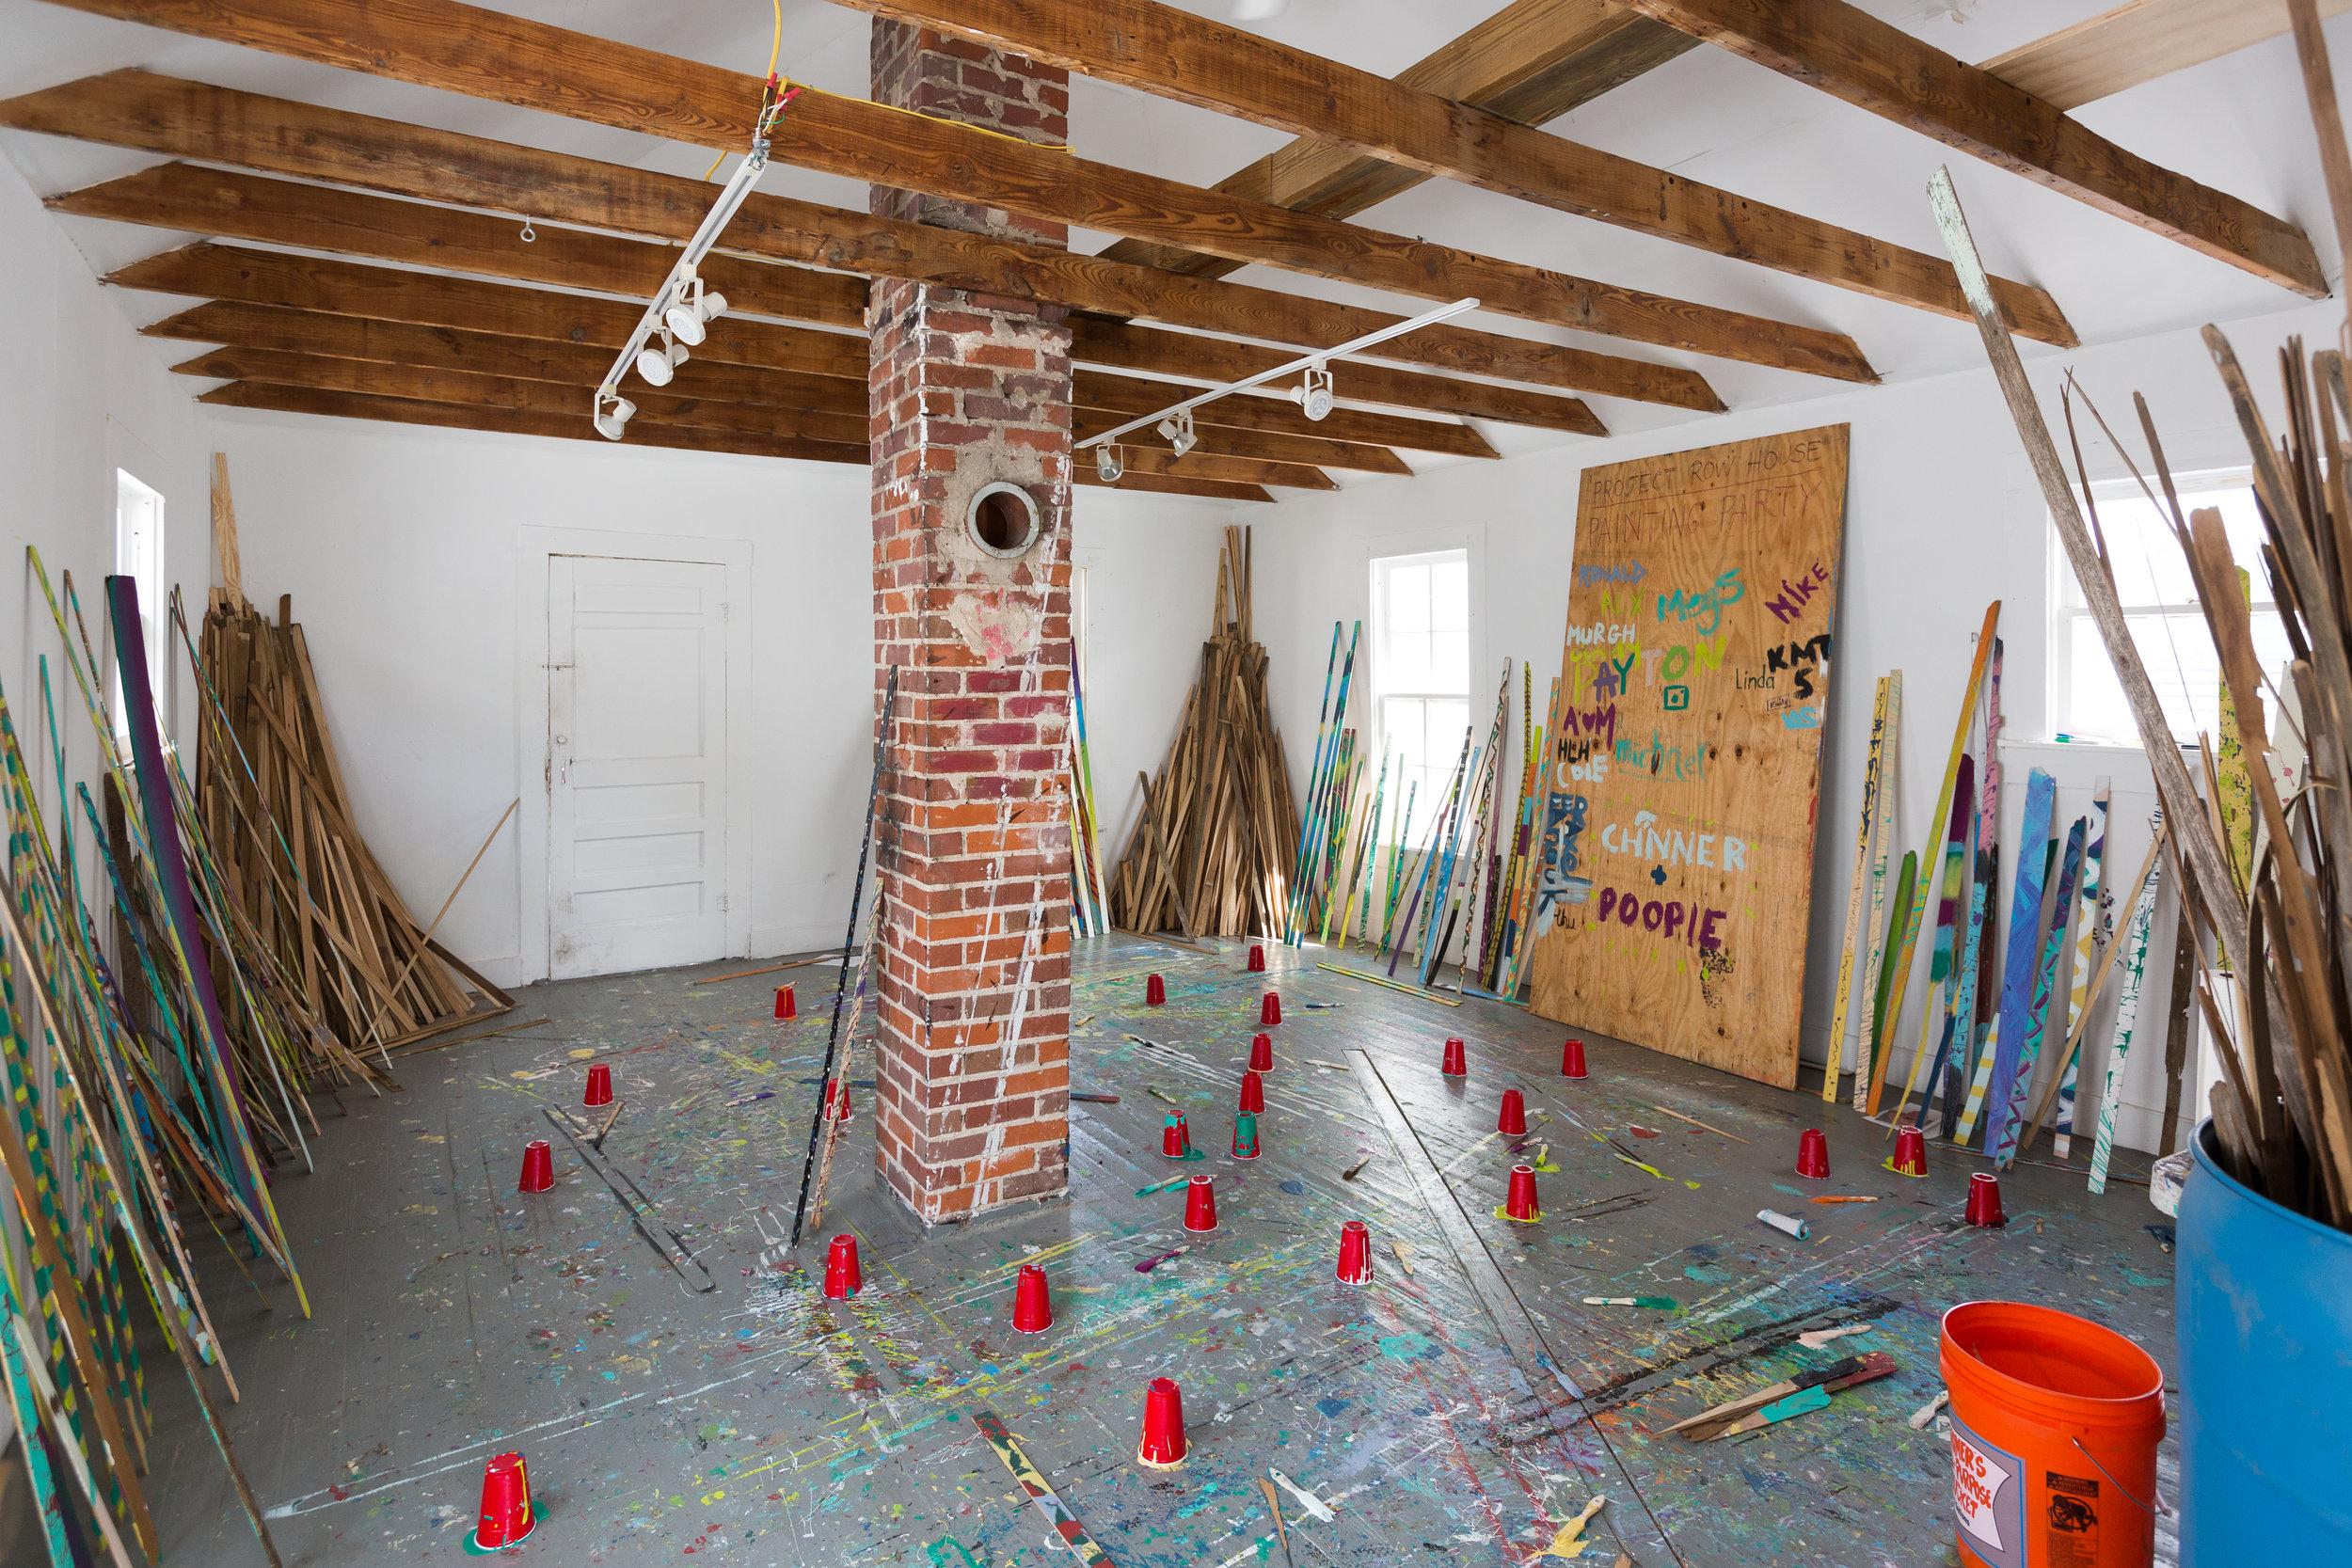 The Building Speaks , Patrick Renner